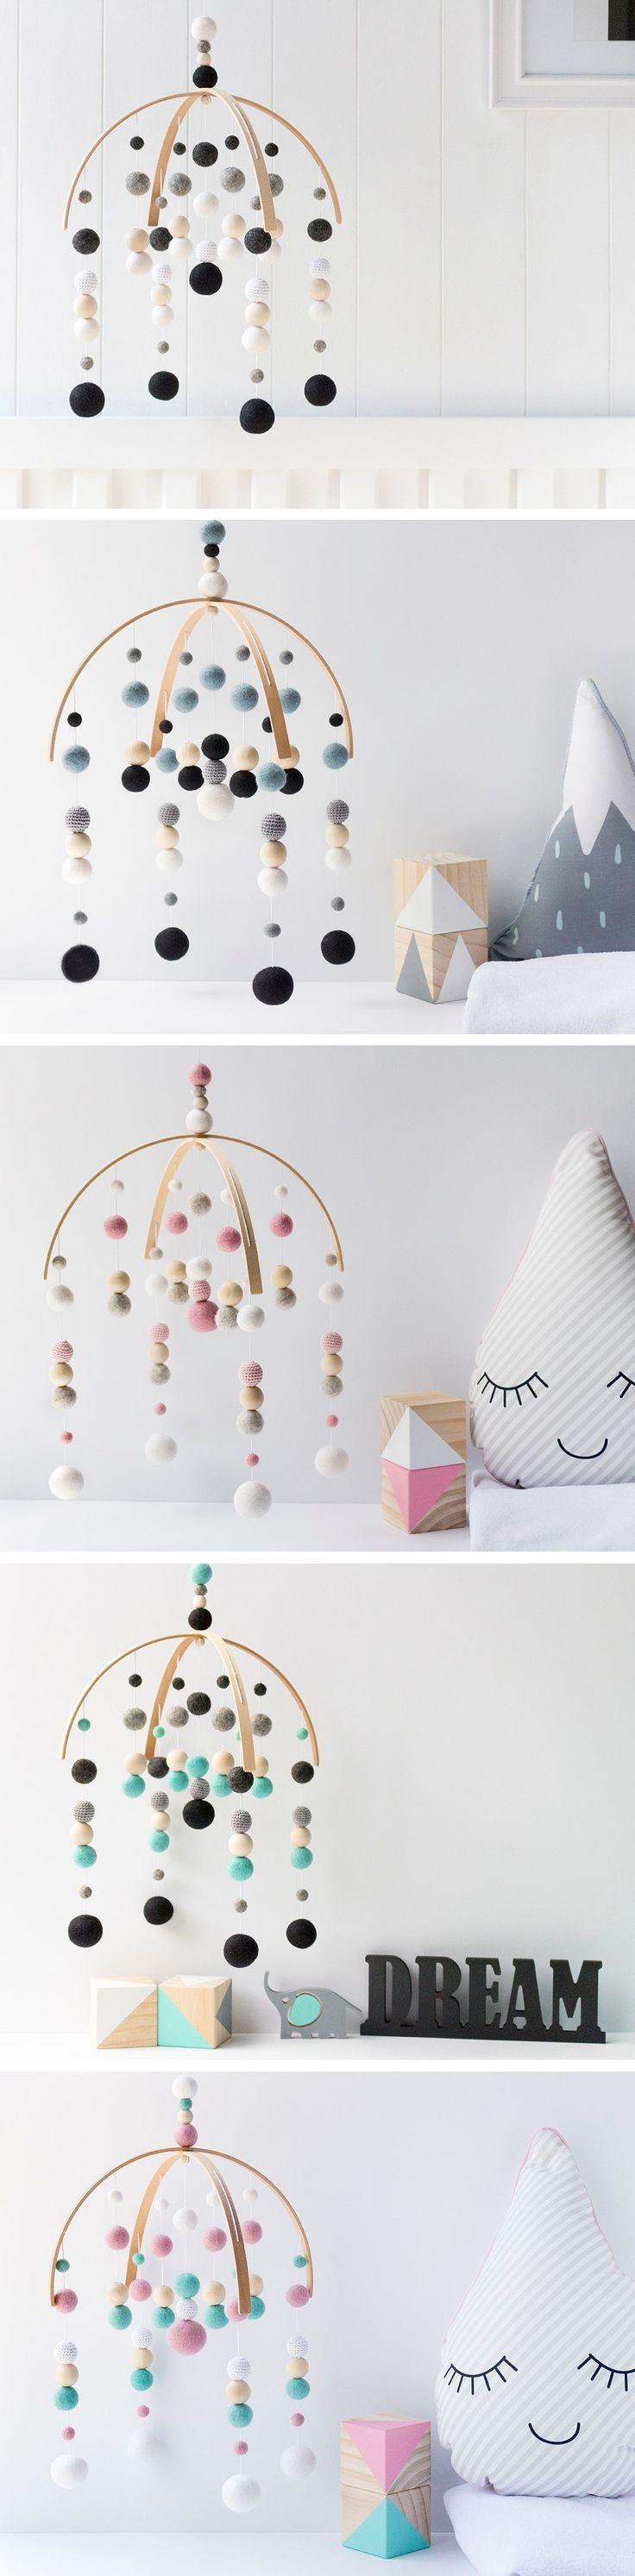 Baby Crib Mobile. Nursery Cot Mobile. Kids Room Decor. Nursery Felt Ball Mobile. Nursery Decor. Gender Neutral. Monochrome Black Baby Mobile